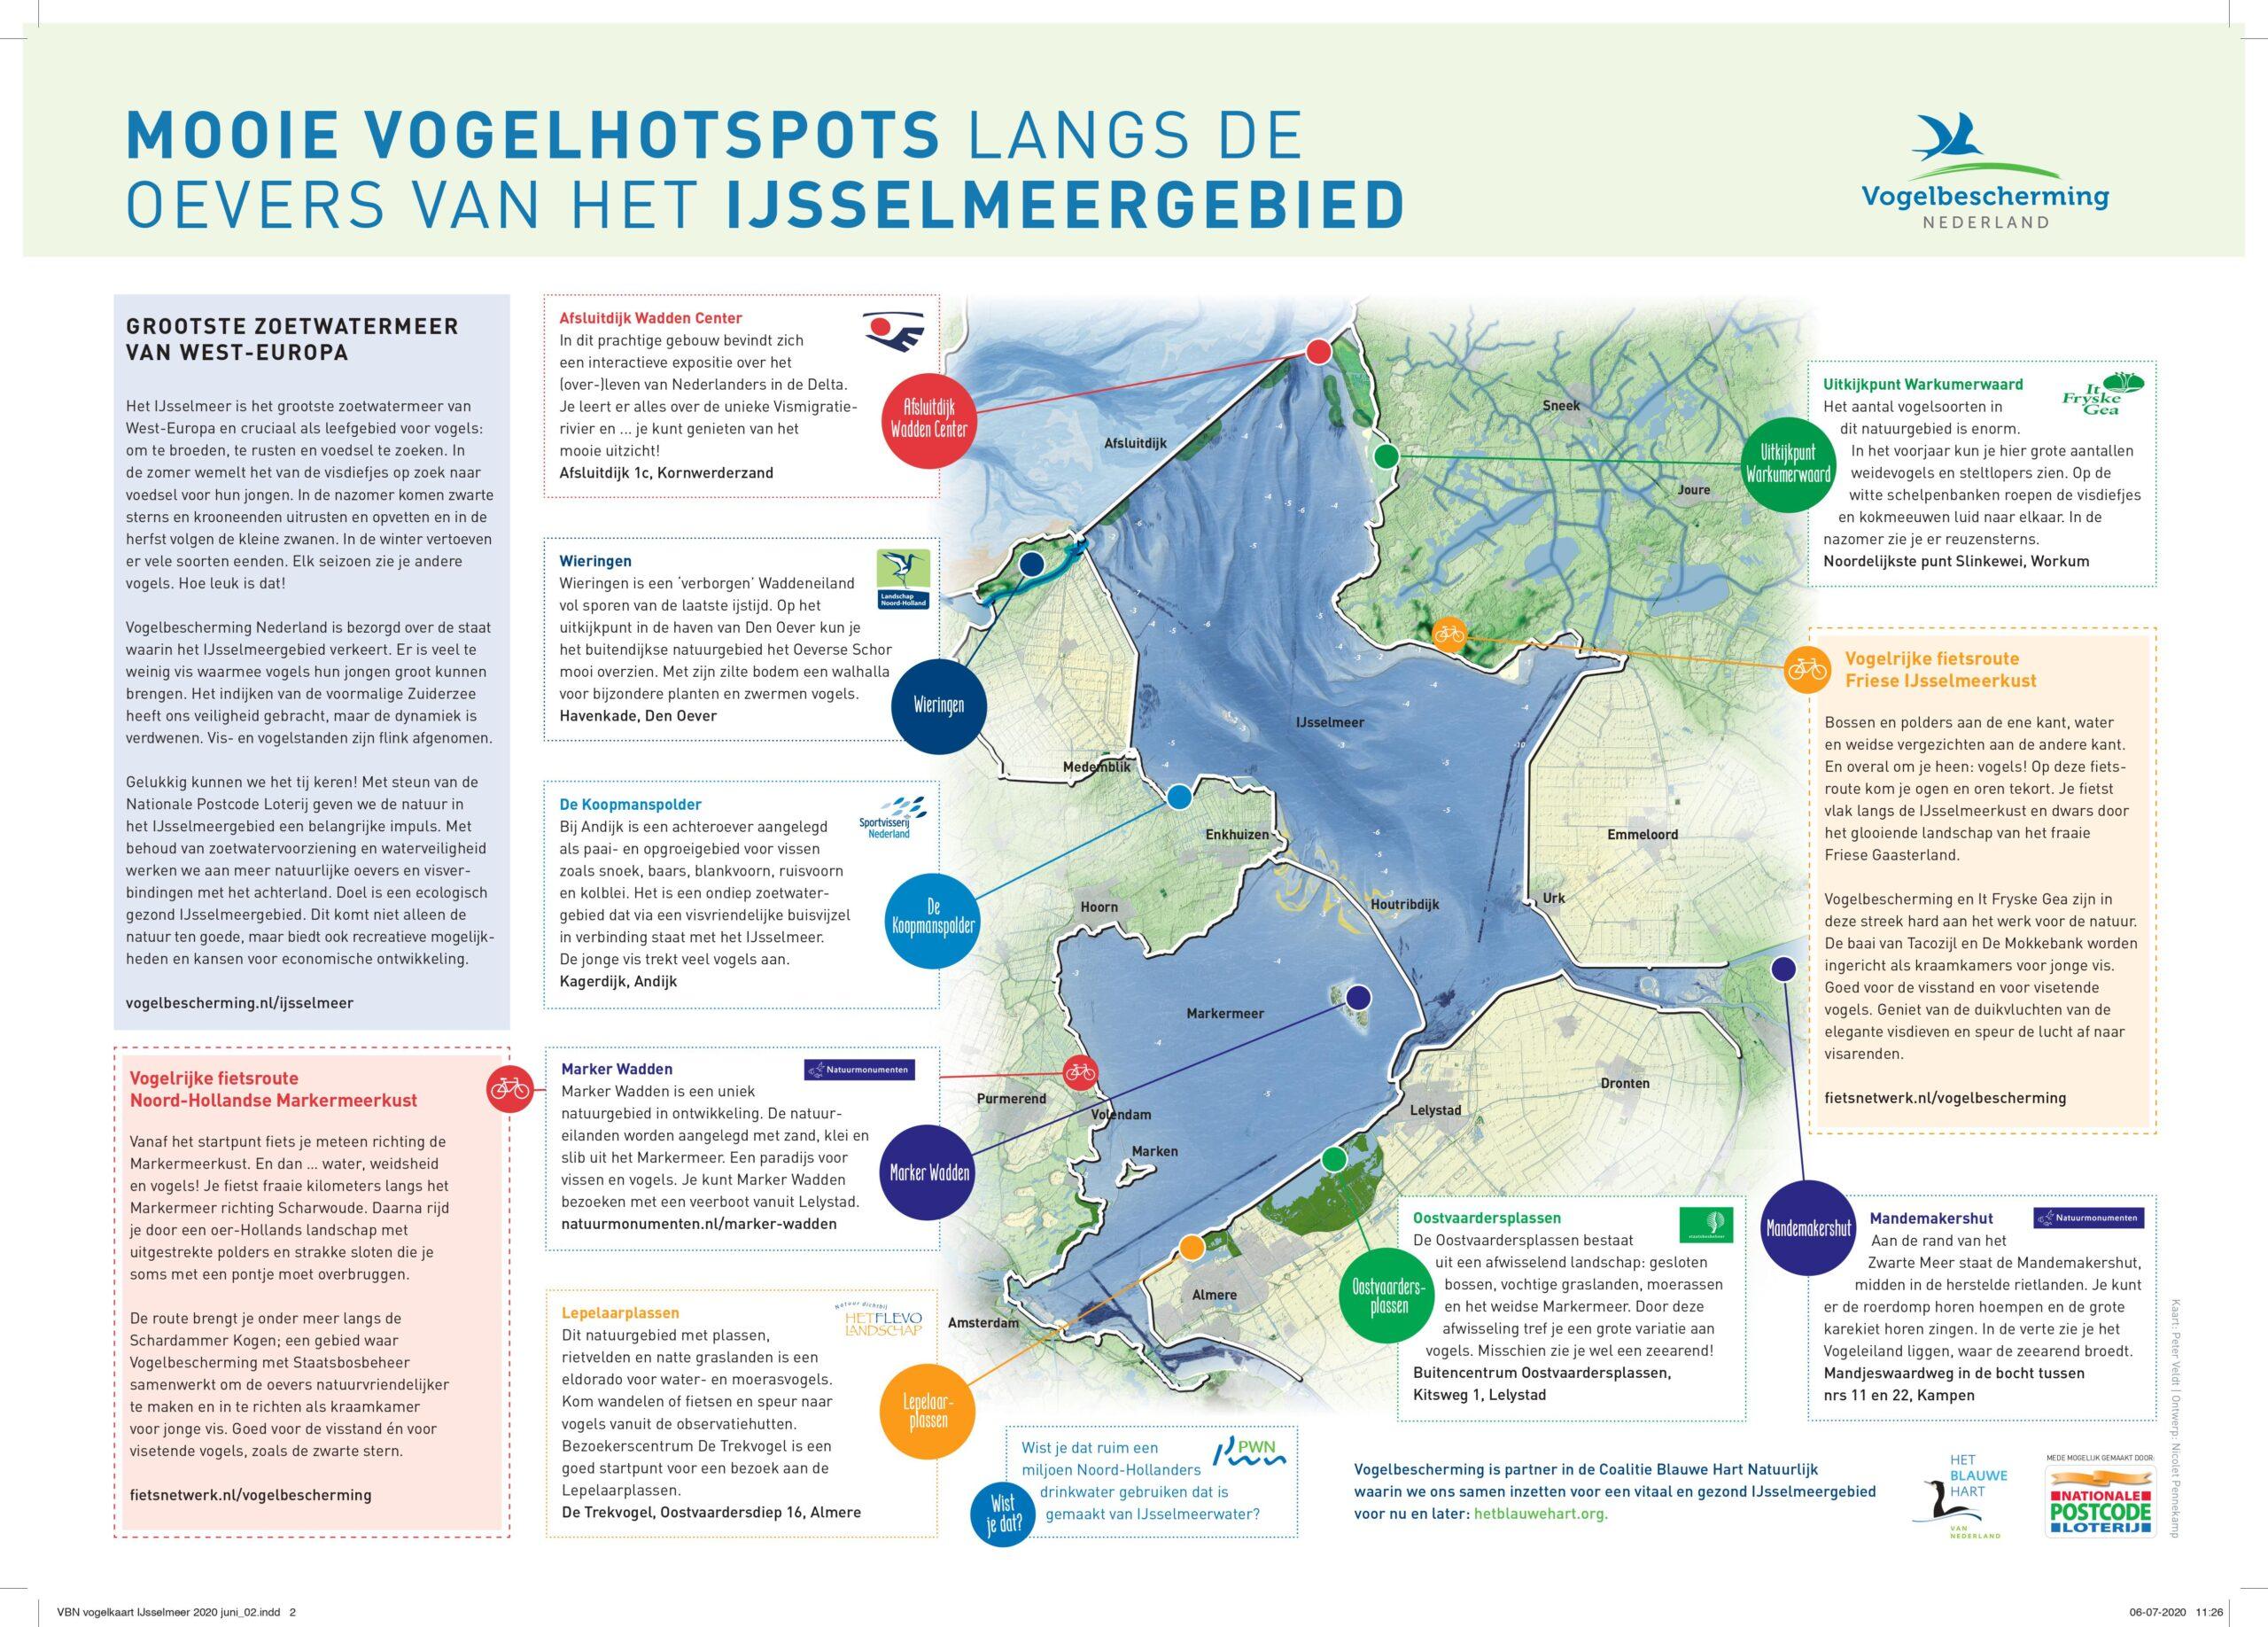 Vogelkaart IJsselmeergebied